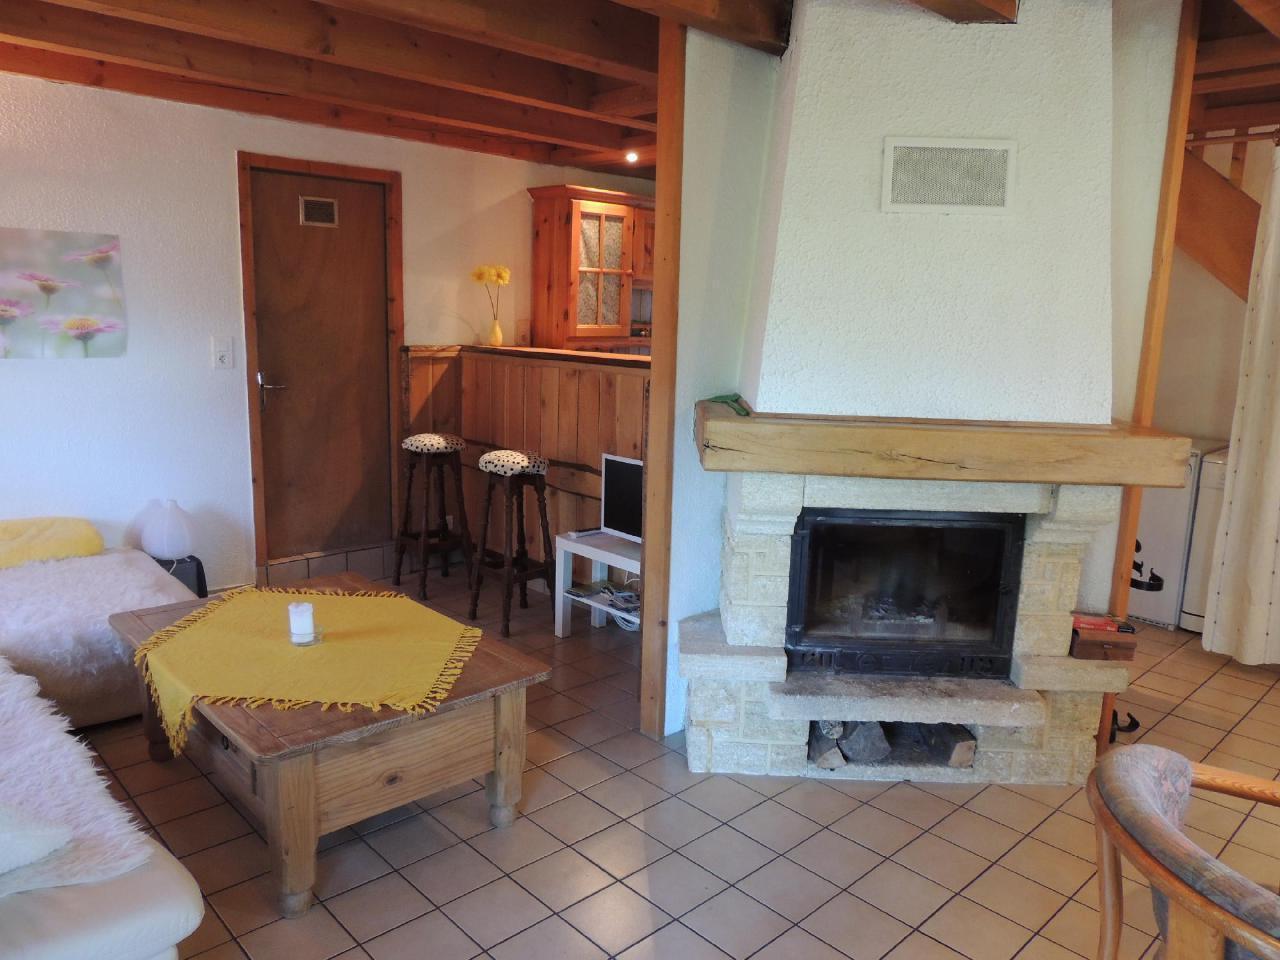 Ferienhaus Steinhäuschen Shila, im Naturparc der Vogesen,  mit Saunahaus (1717460), La Rosière, Haute-Saône, Franche-Comté, Frankreich, Bild 9